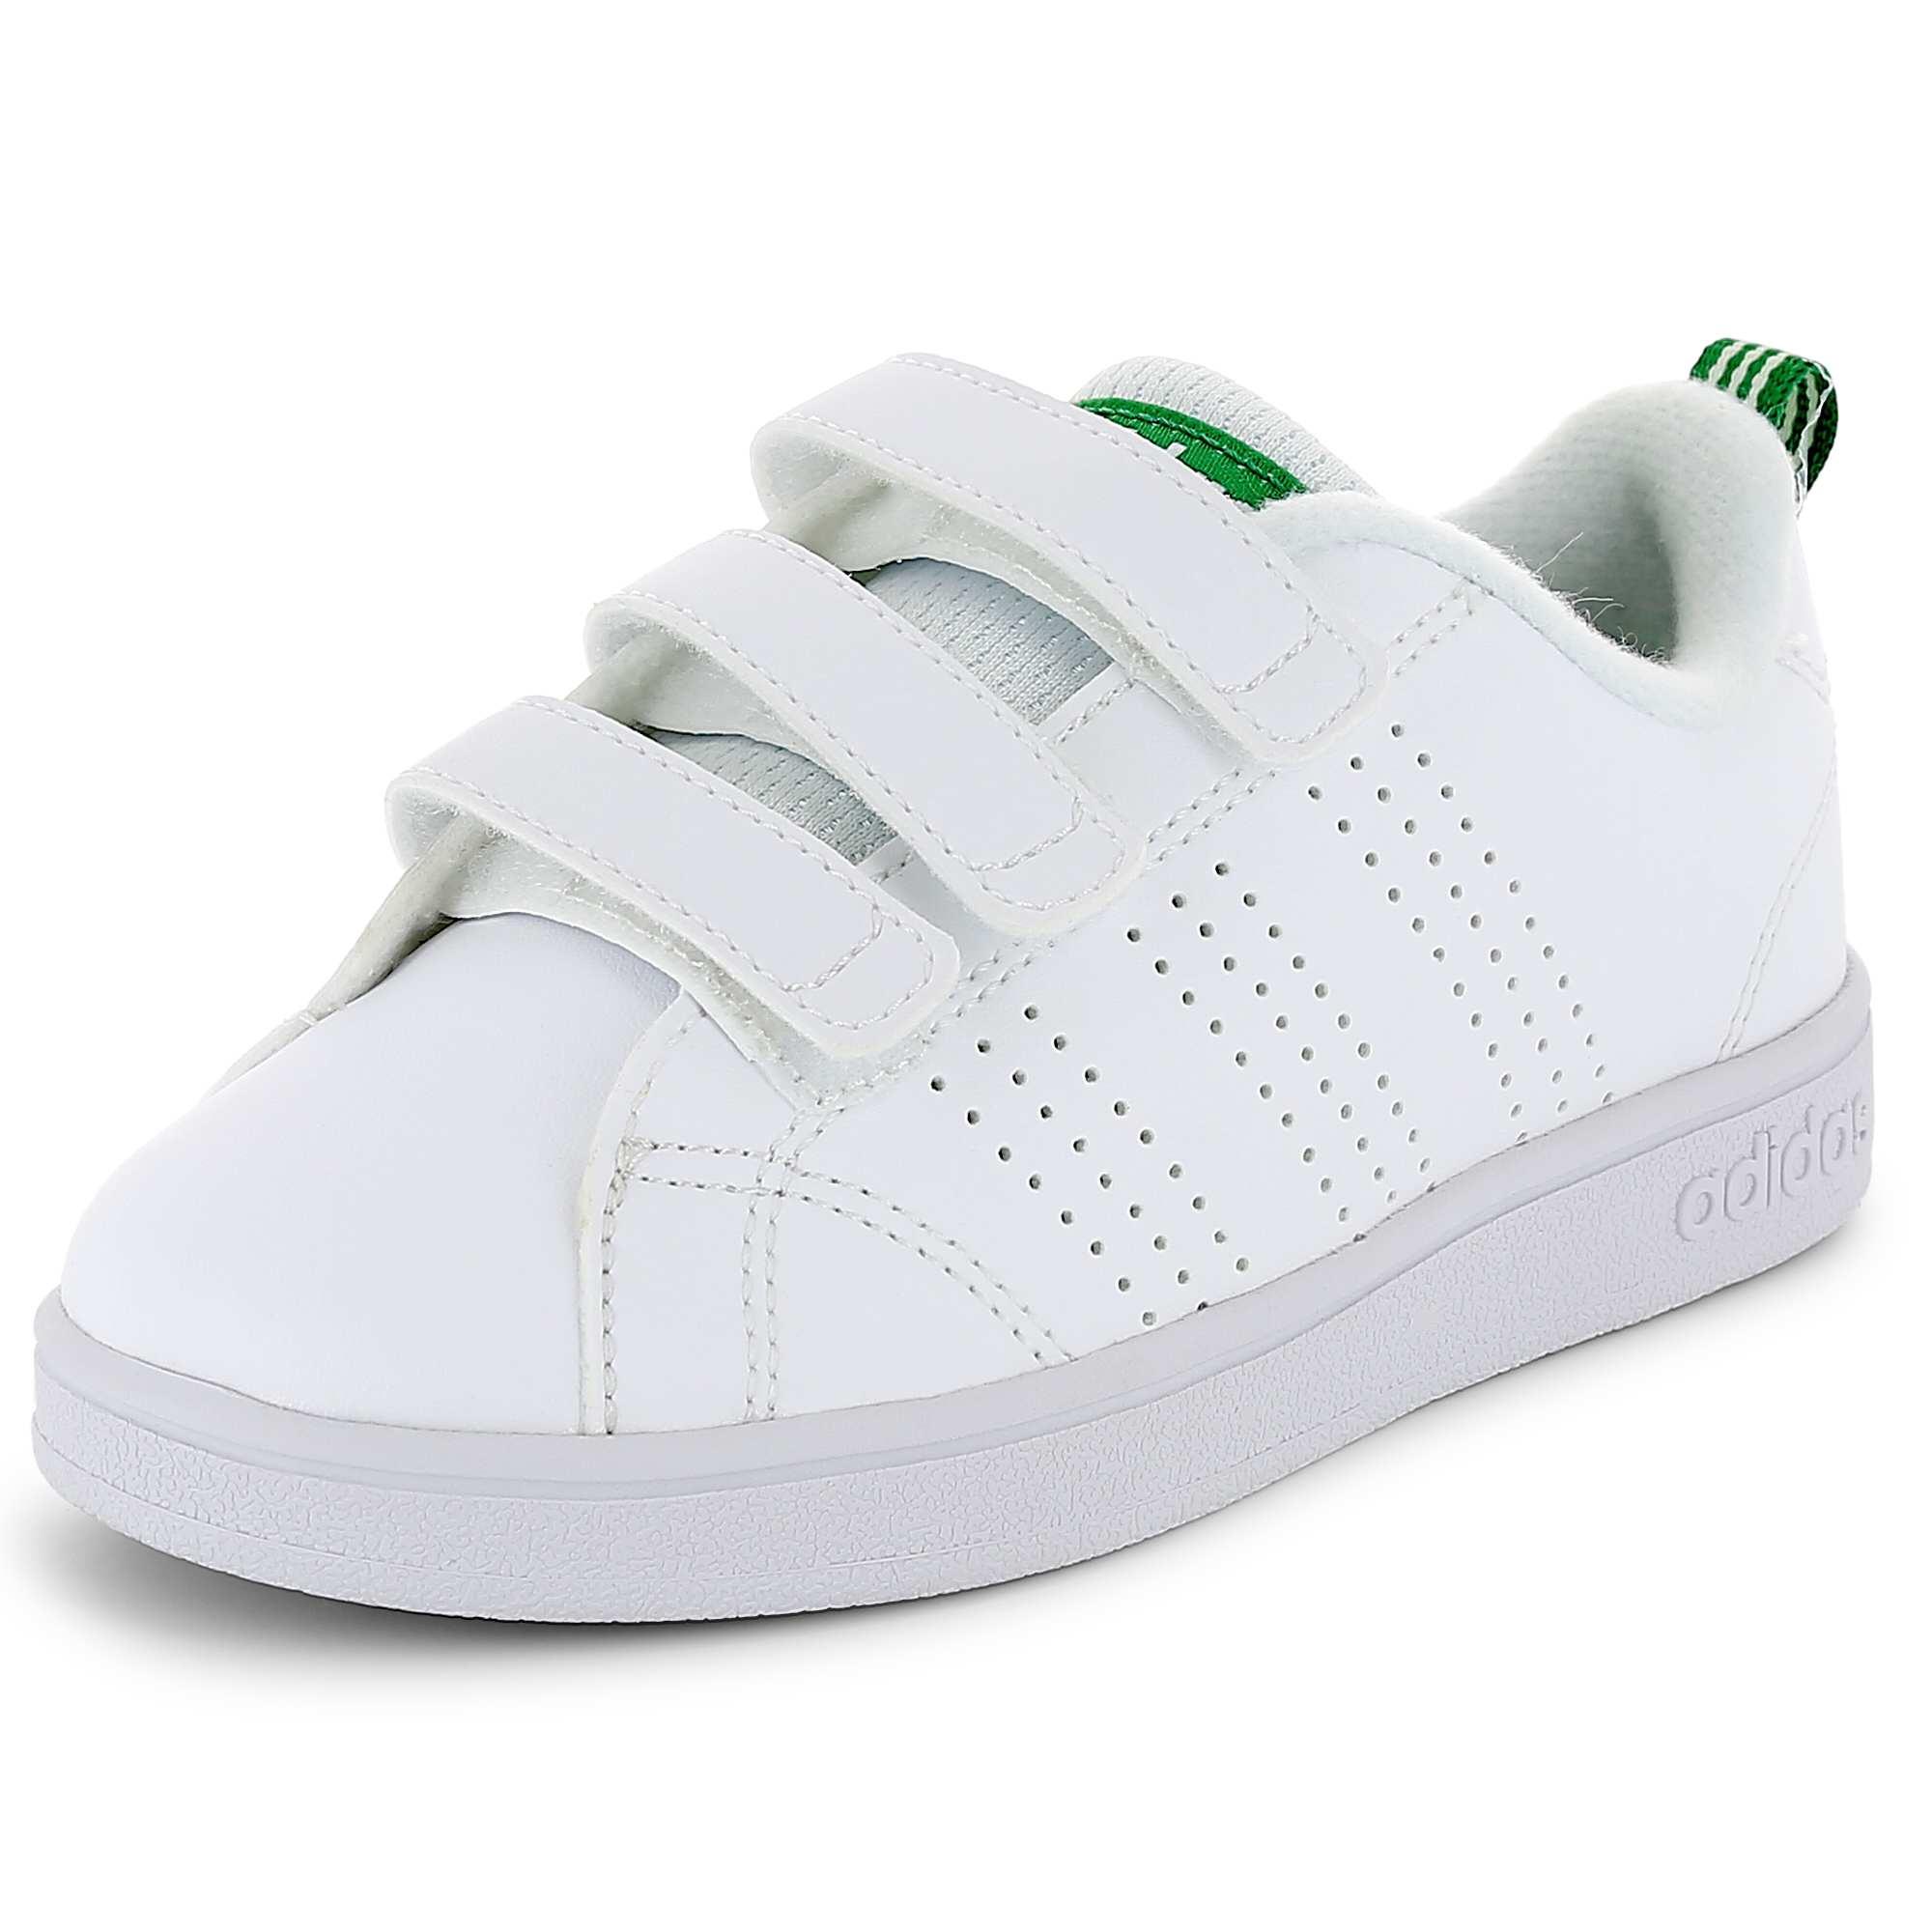 501c3723bc075 Ténis  Adidas VS Advantage Clean  com tiras de velcro blanco Menino 3-12.  Loading zoom